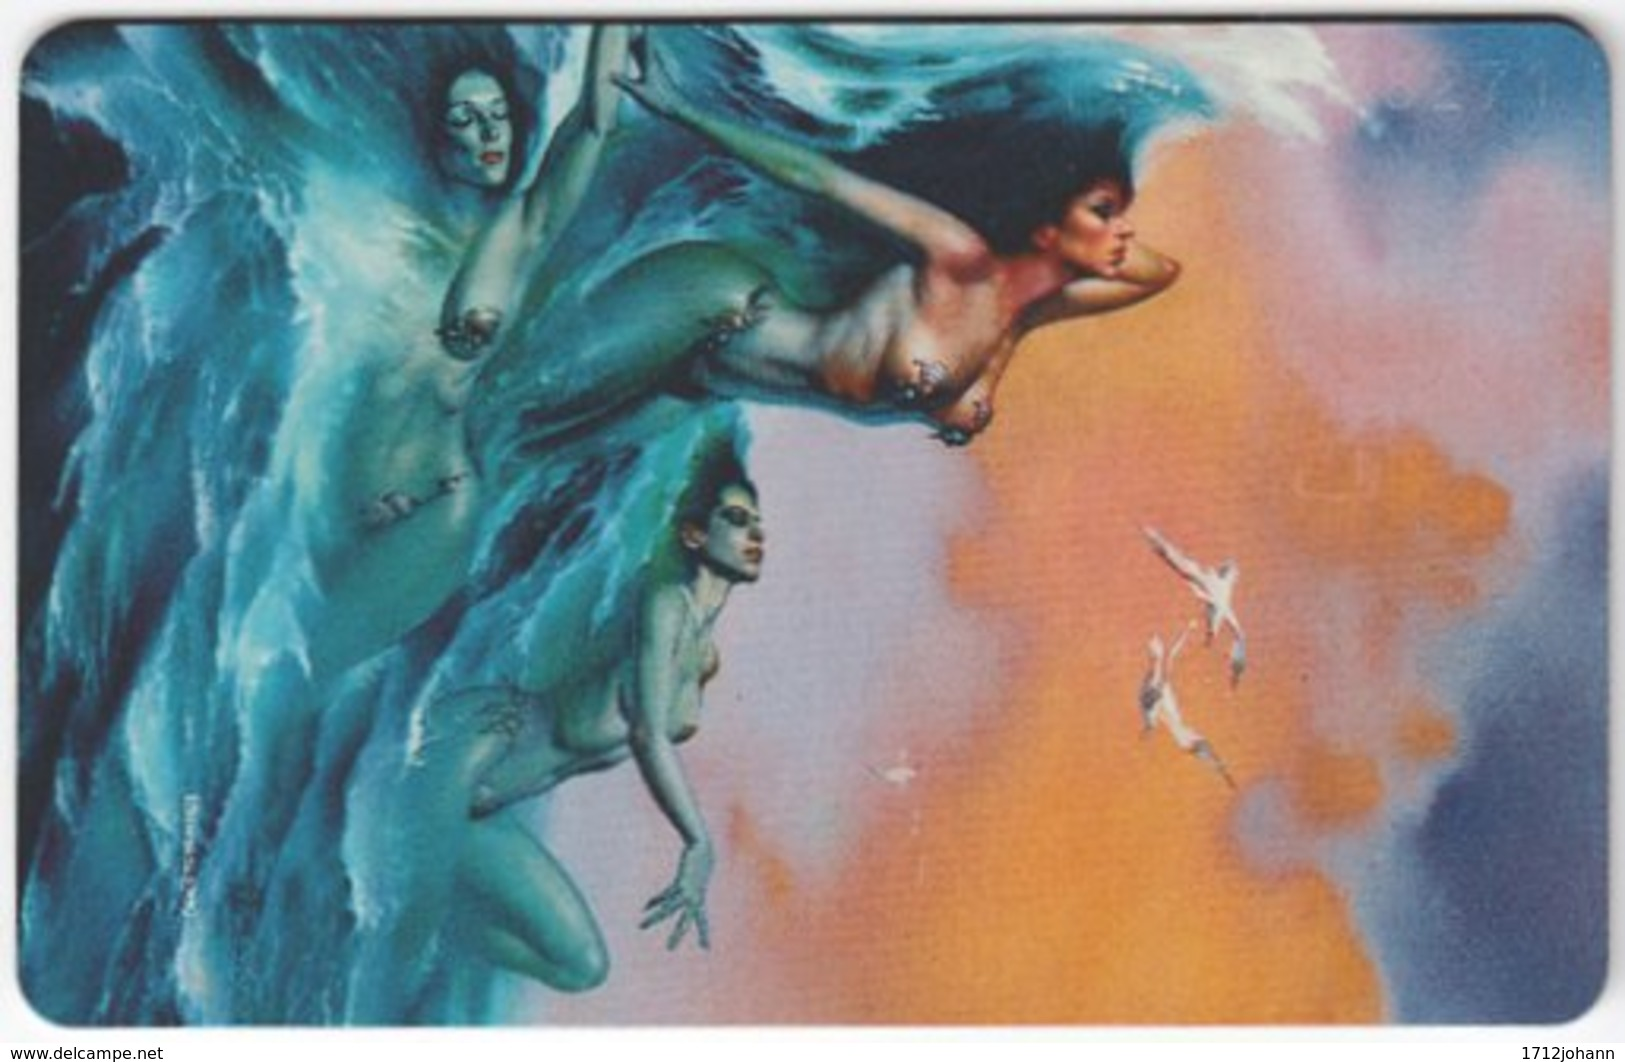 GERMANY K-Serie A-557 - 119 04.93 - Painting, Phantasy - MINT - Deutschland